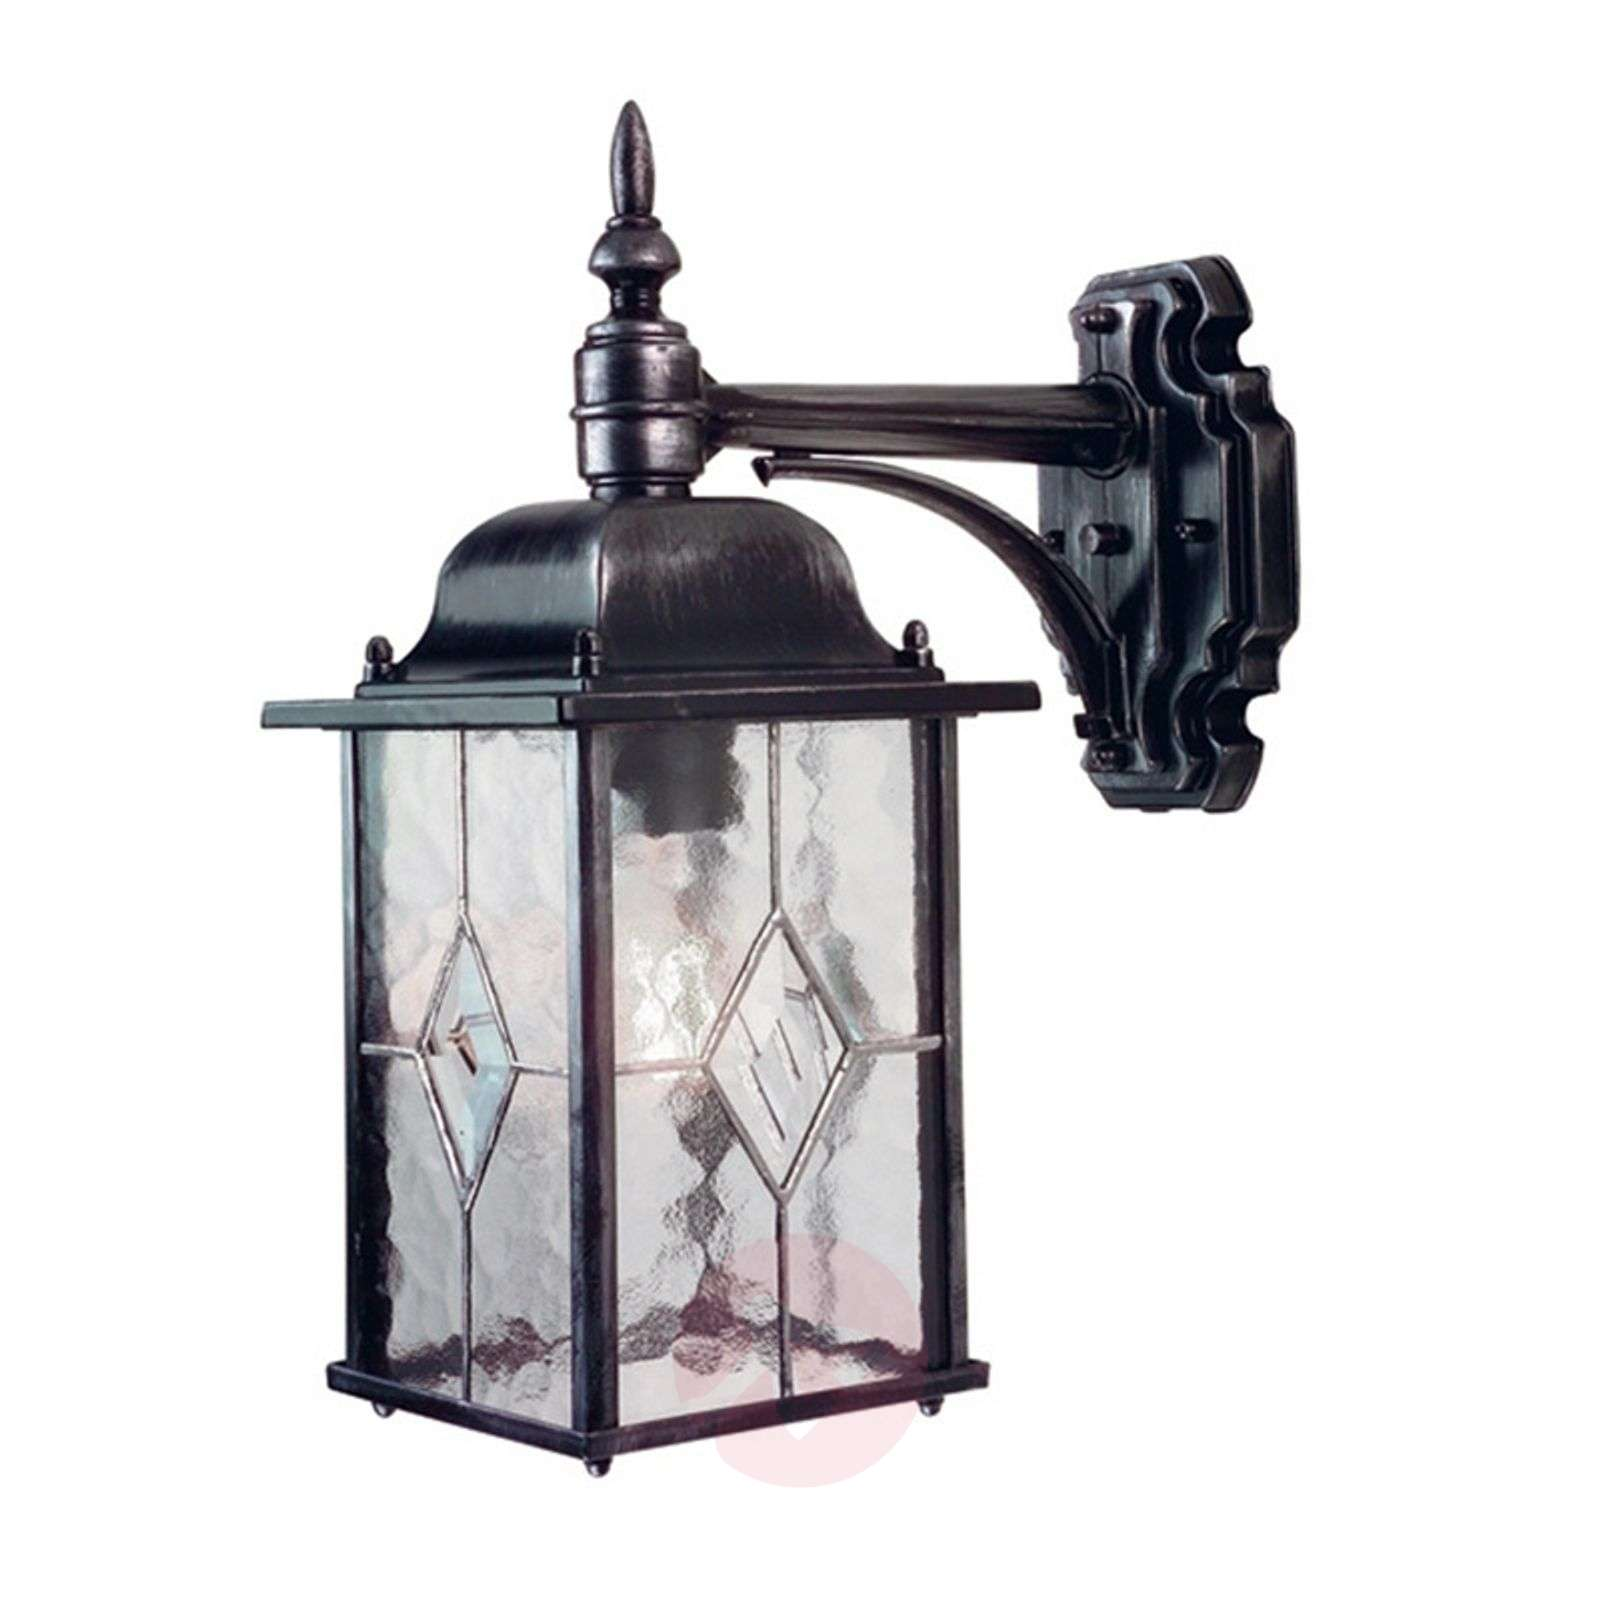 Wexford Outside Wall Light Lantern Shape-3048210-01